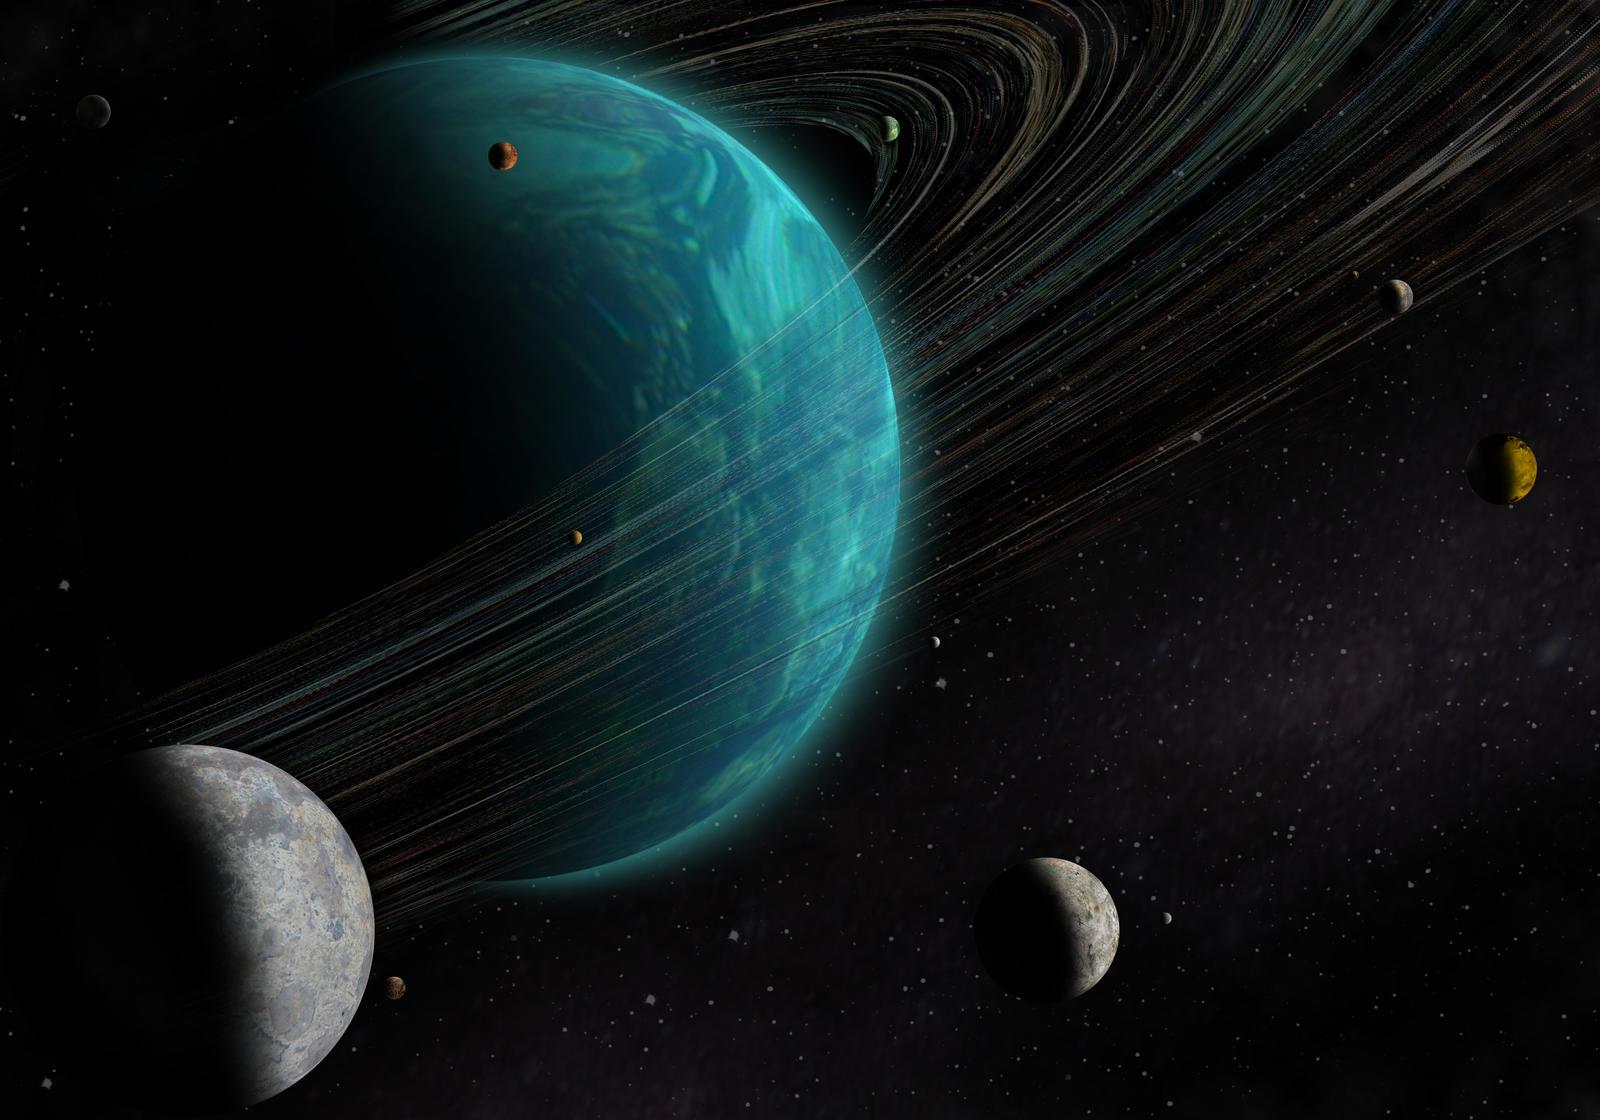 blue giant planet - photo #12